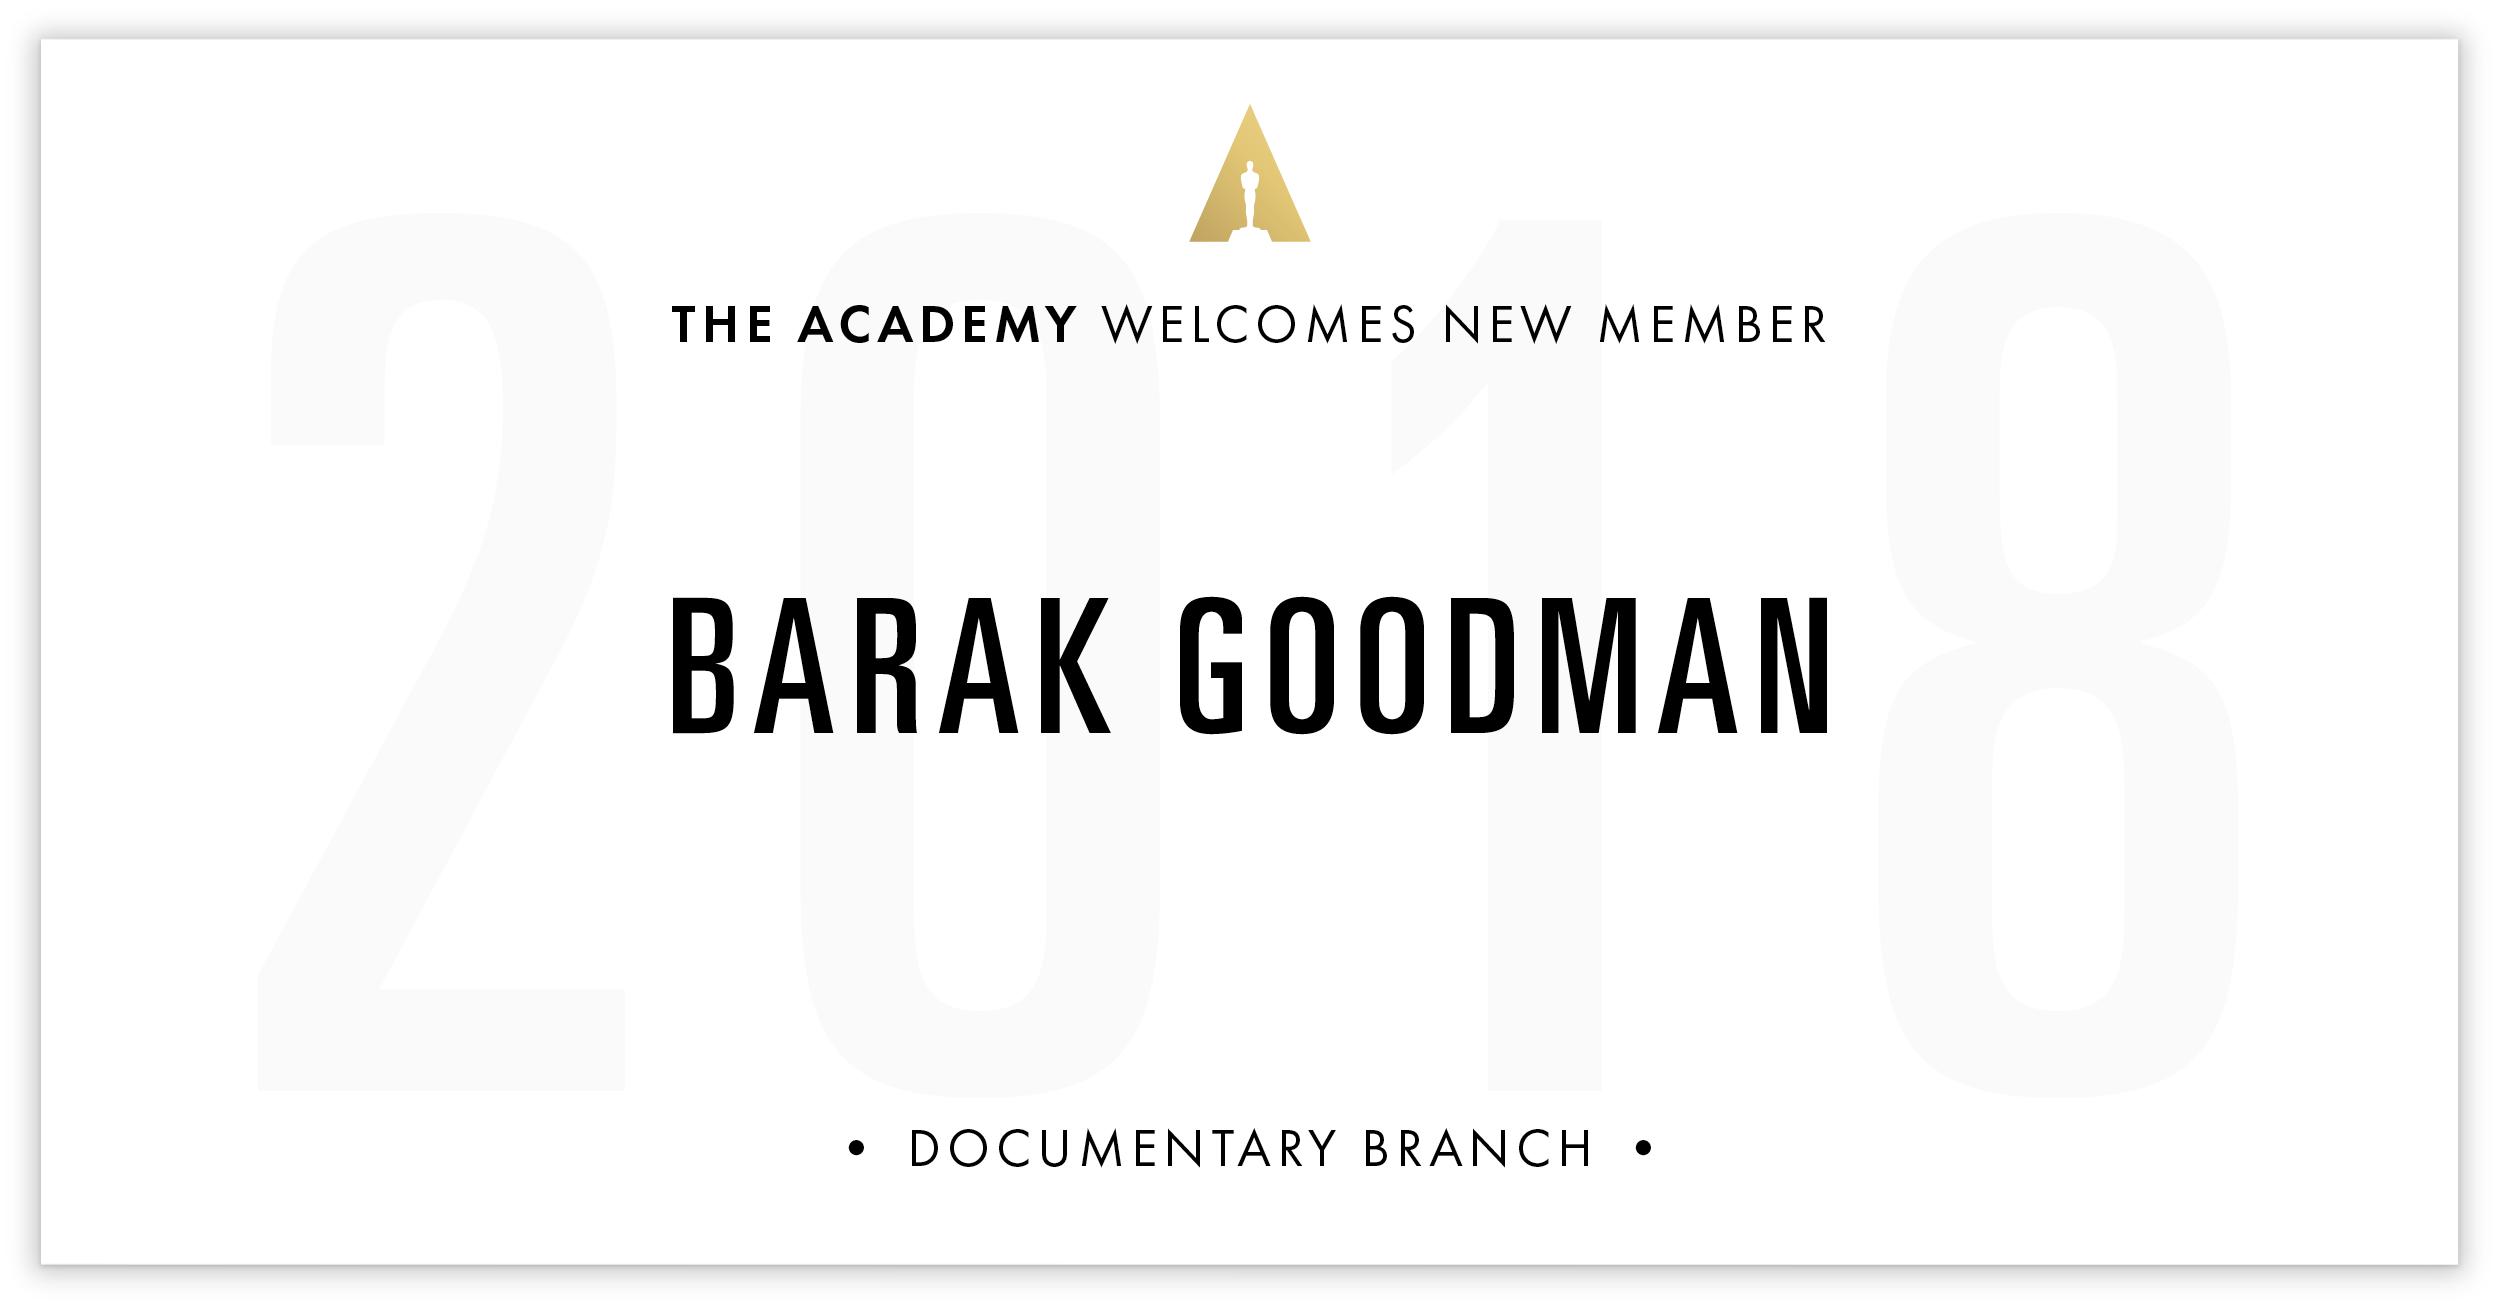 Barak Goodman is invited!